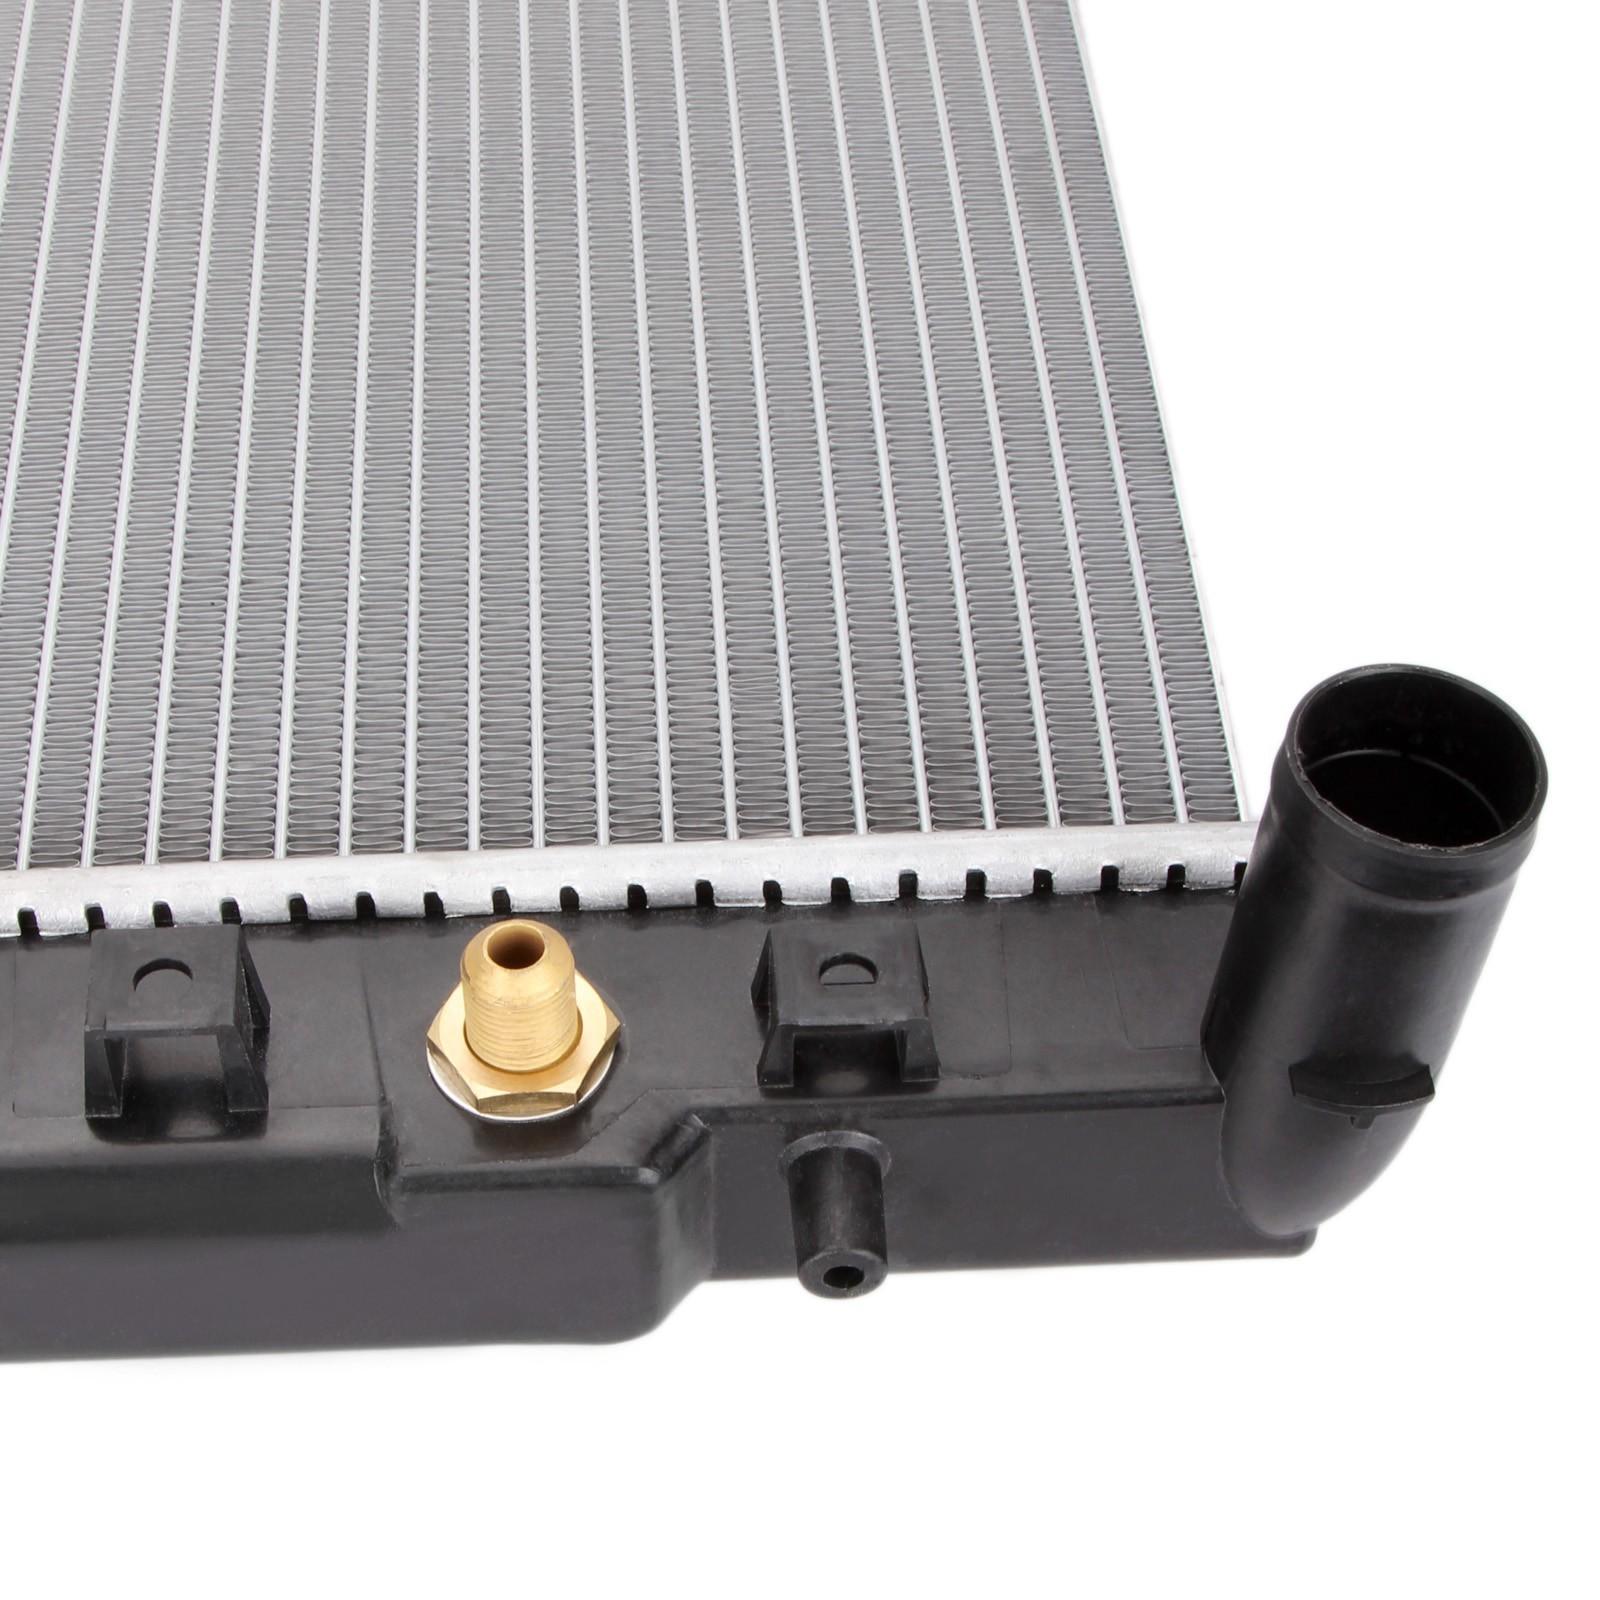 Hot holden radiators for sale statesman Dromedary Brand